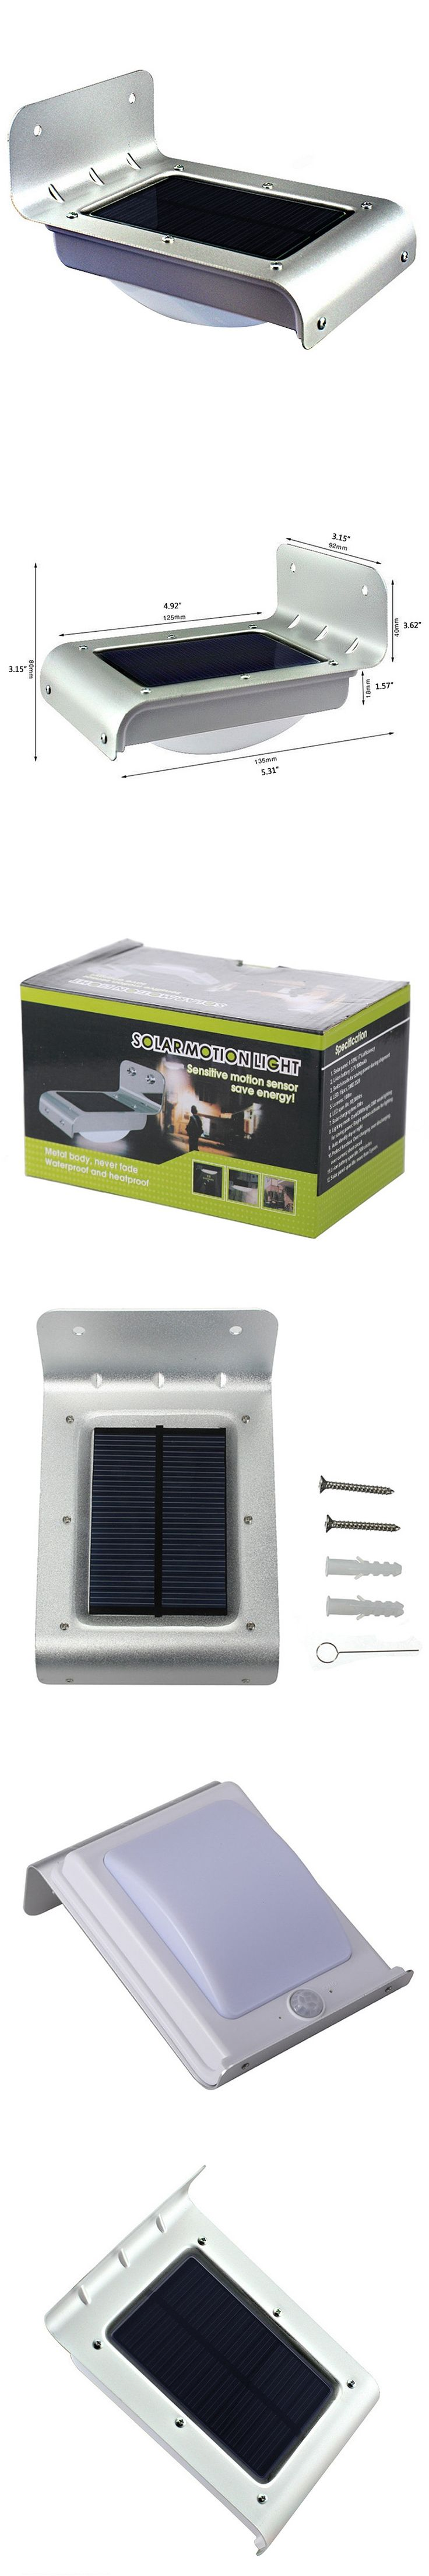 24 LED Motion Sensor Light Waterproof Solar Powered Lamp Wall Mount Lamp Night Light Outdoor Garden Path Lighting VEN45 T10